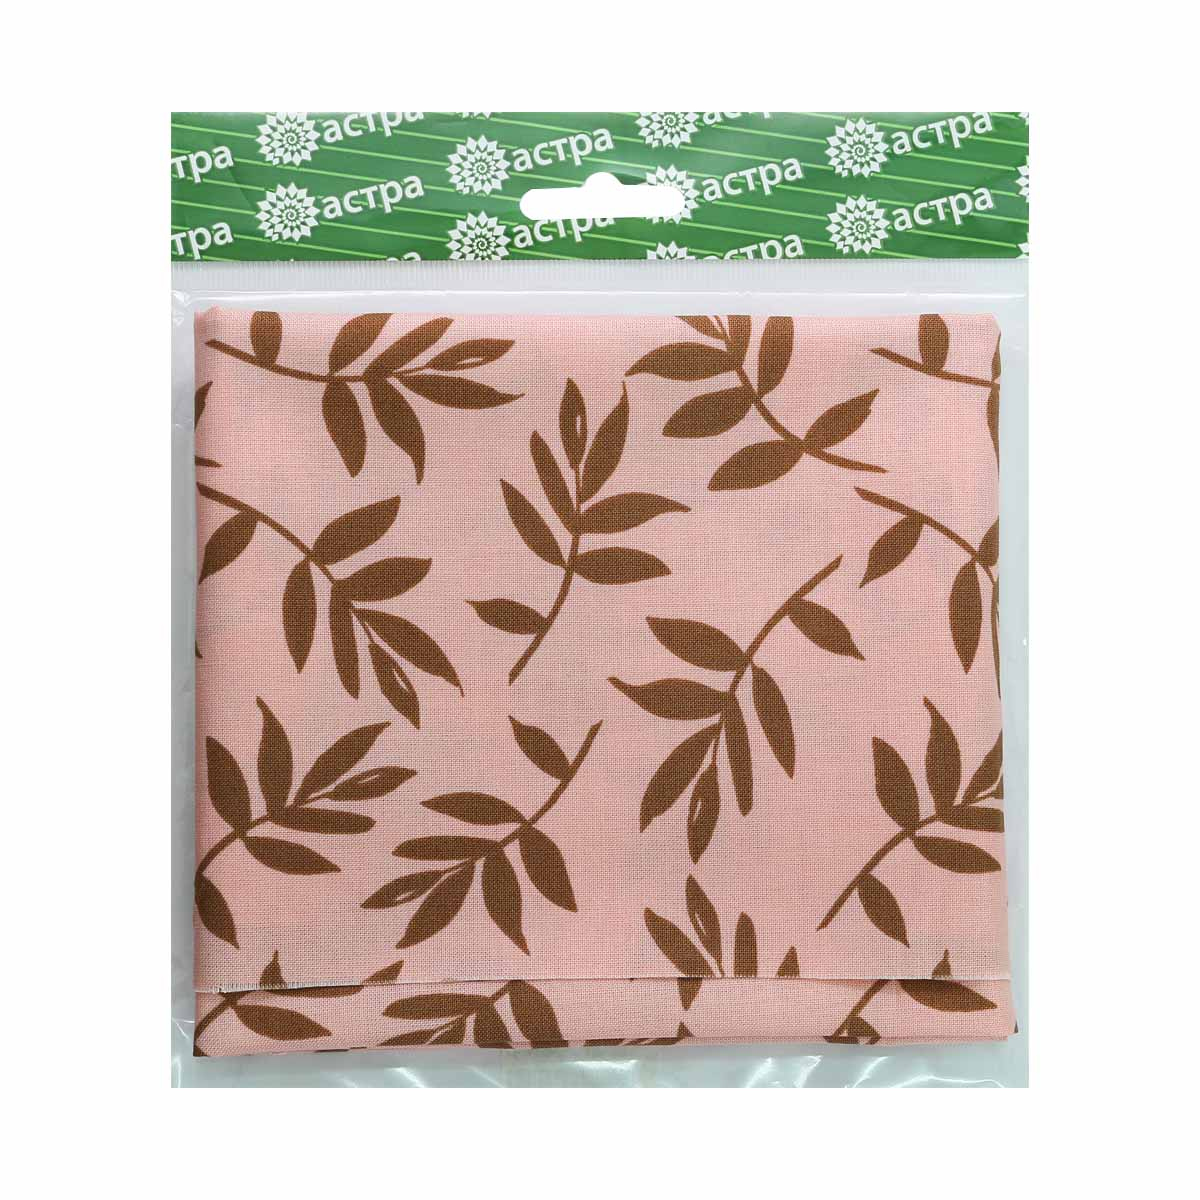 PWNW015 Peach FREE SPIRIT Ткань 100% хл,50*55см